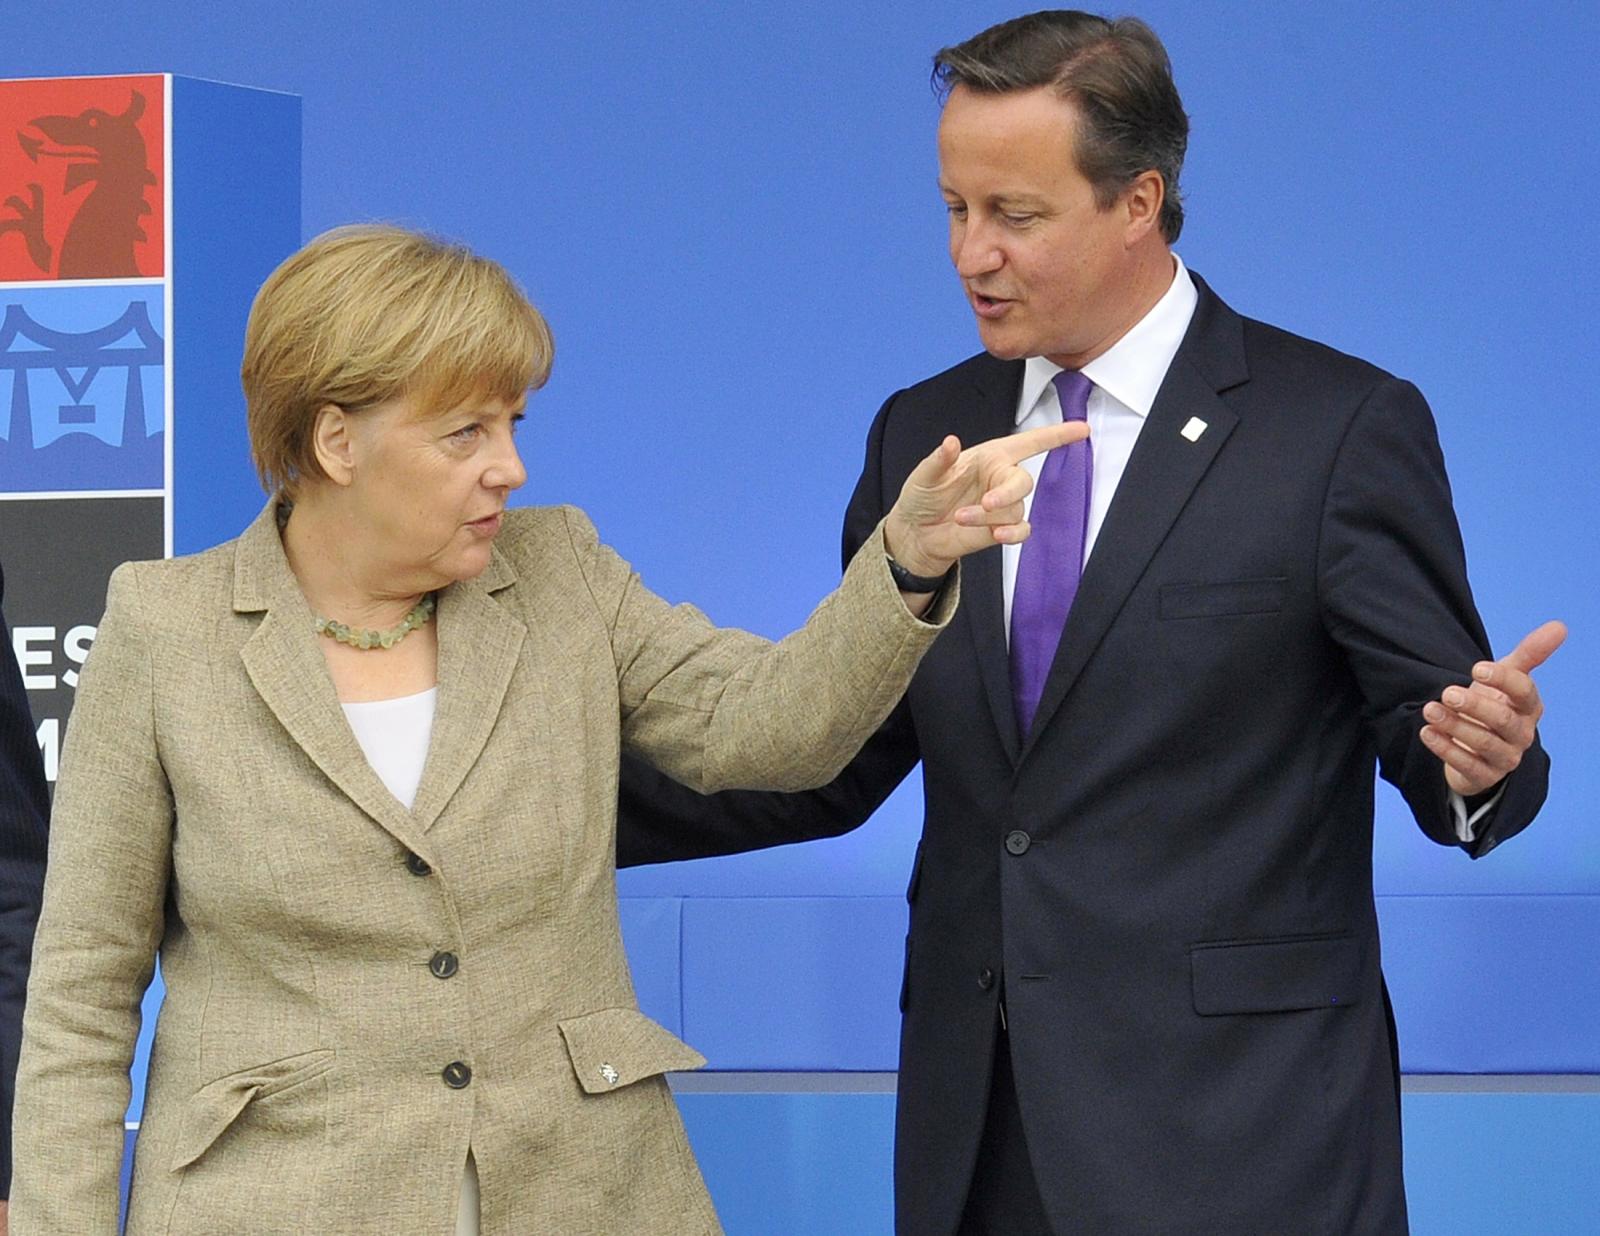 Britain's Prime Minister David Cameron (R) greets German Chancellor Angela Merkel